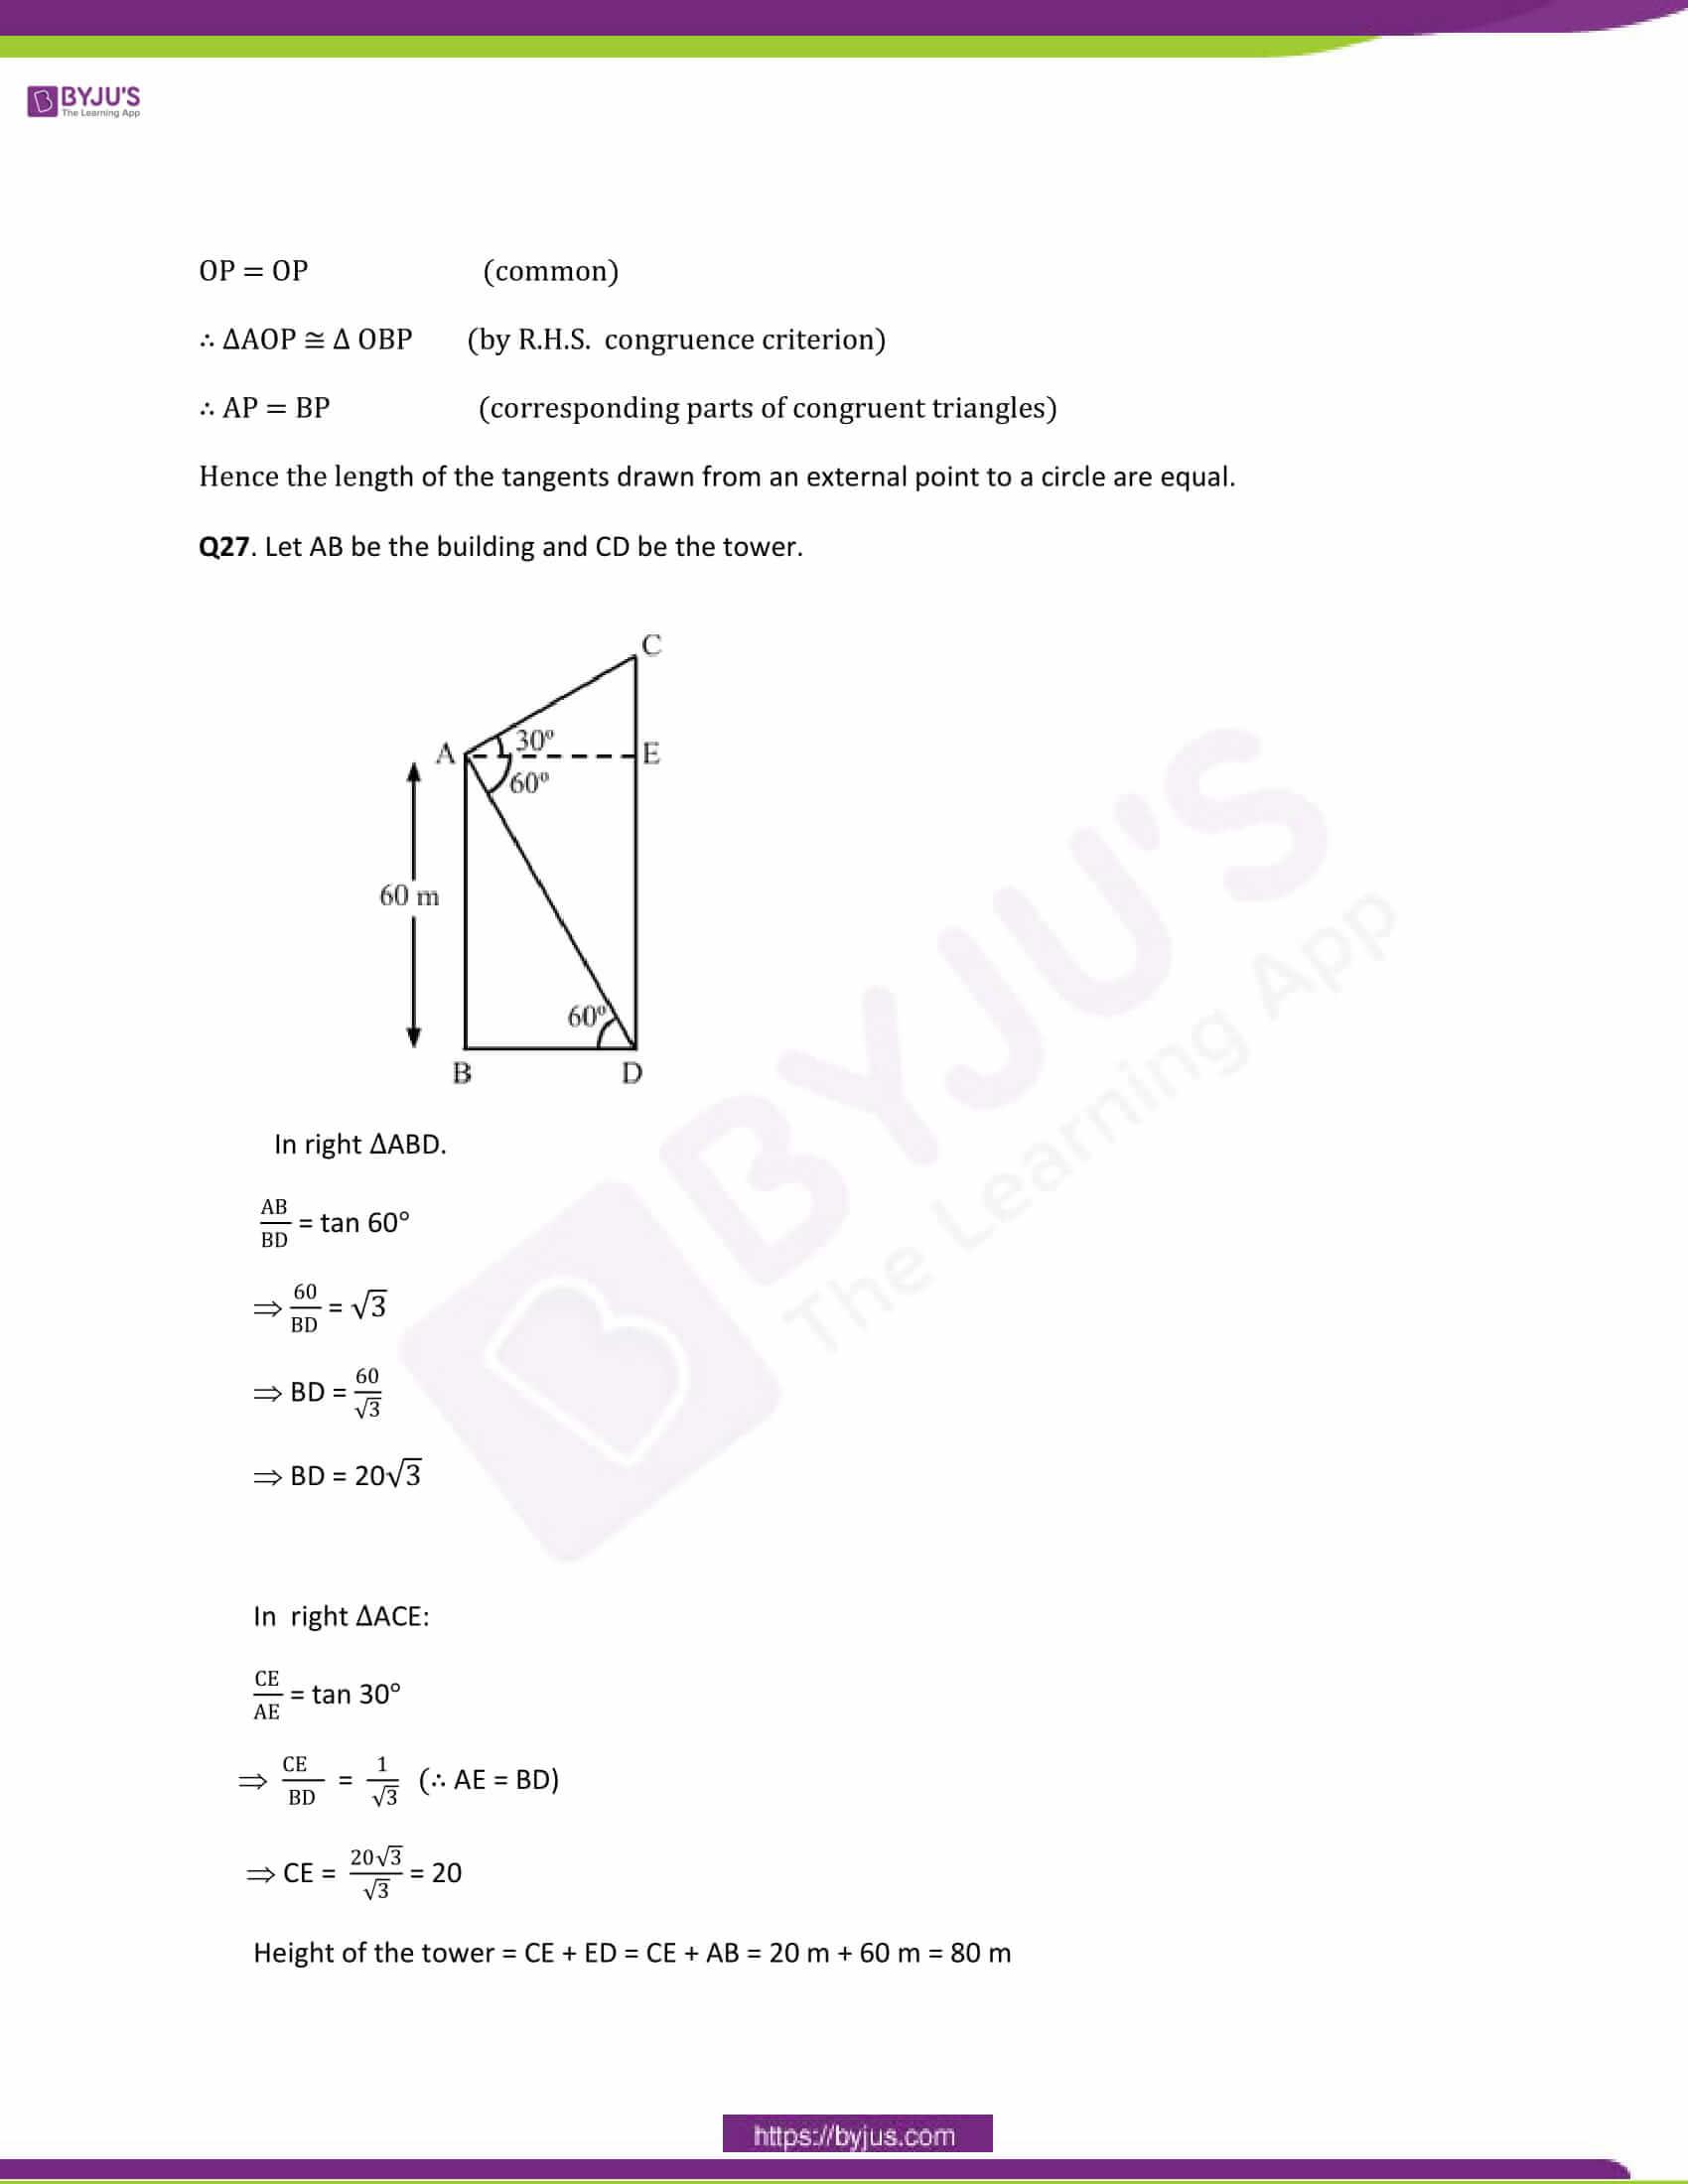 CBSE Class 10 Maths Papers Solution 2014 19